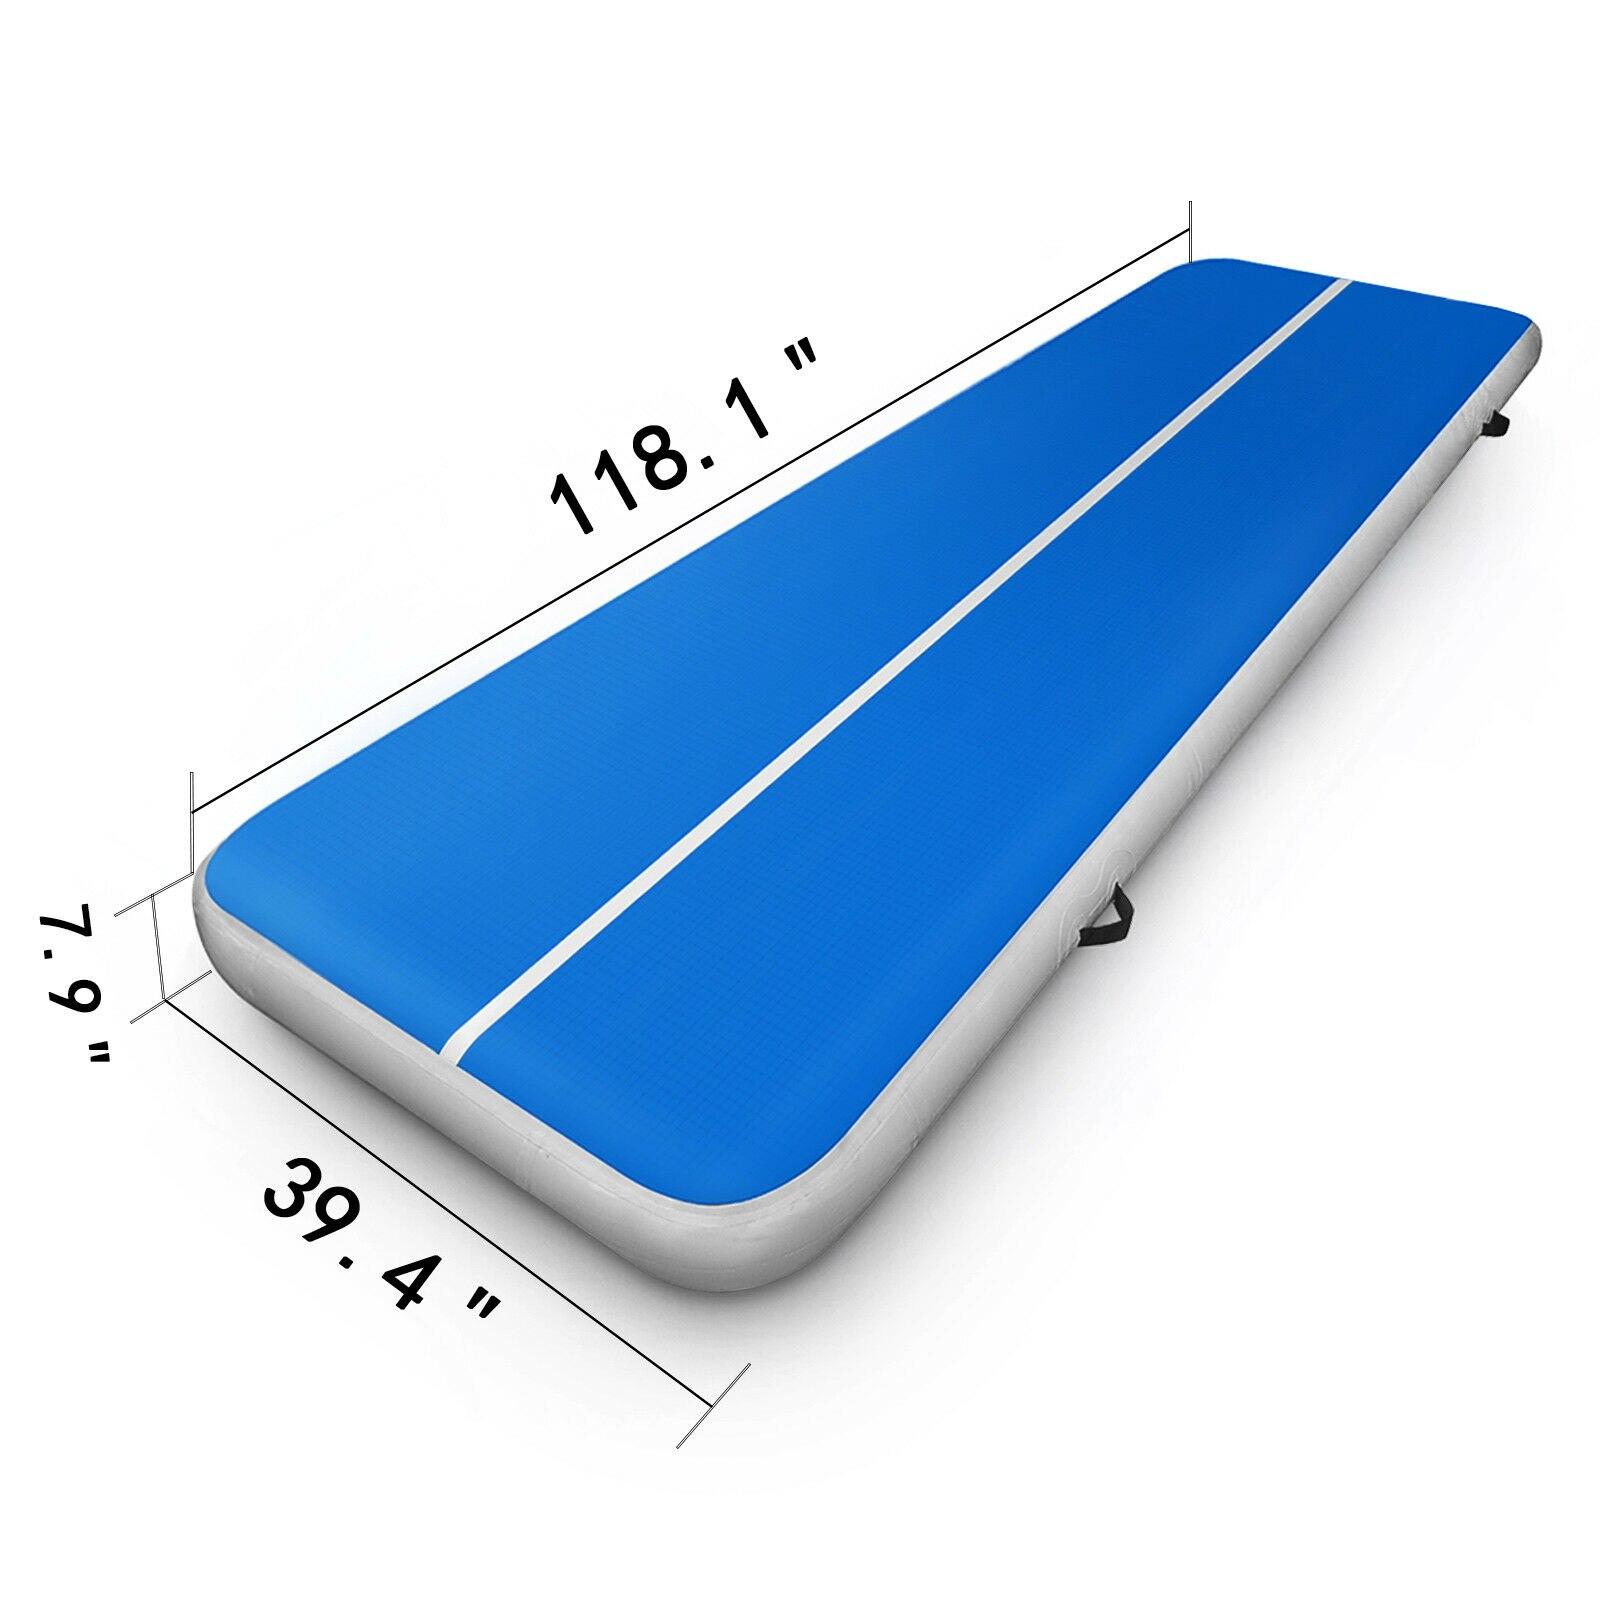 3 X10Ft  1x3M  Air Track Floor Home Gymnastics Tumbling Mat Inflatable Air Tumbling Track GYM